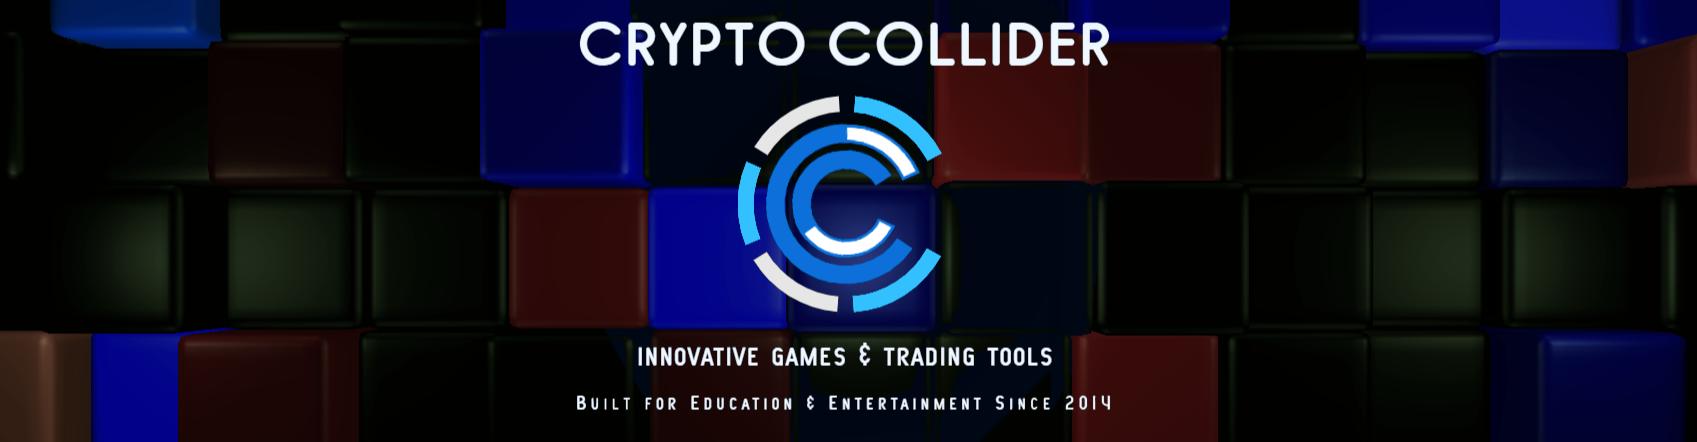 Crypto Collider